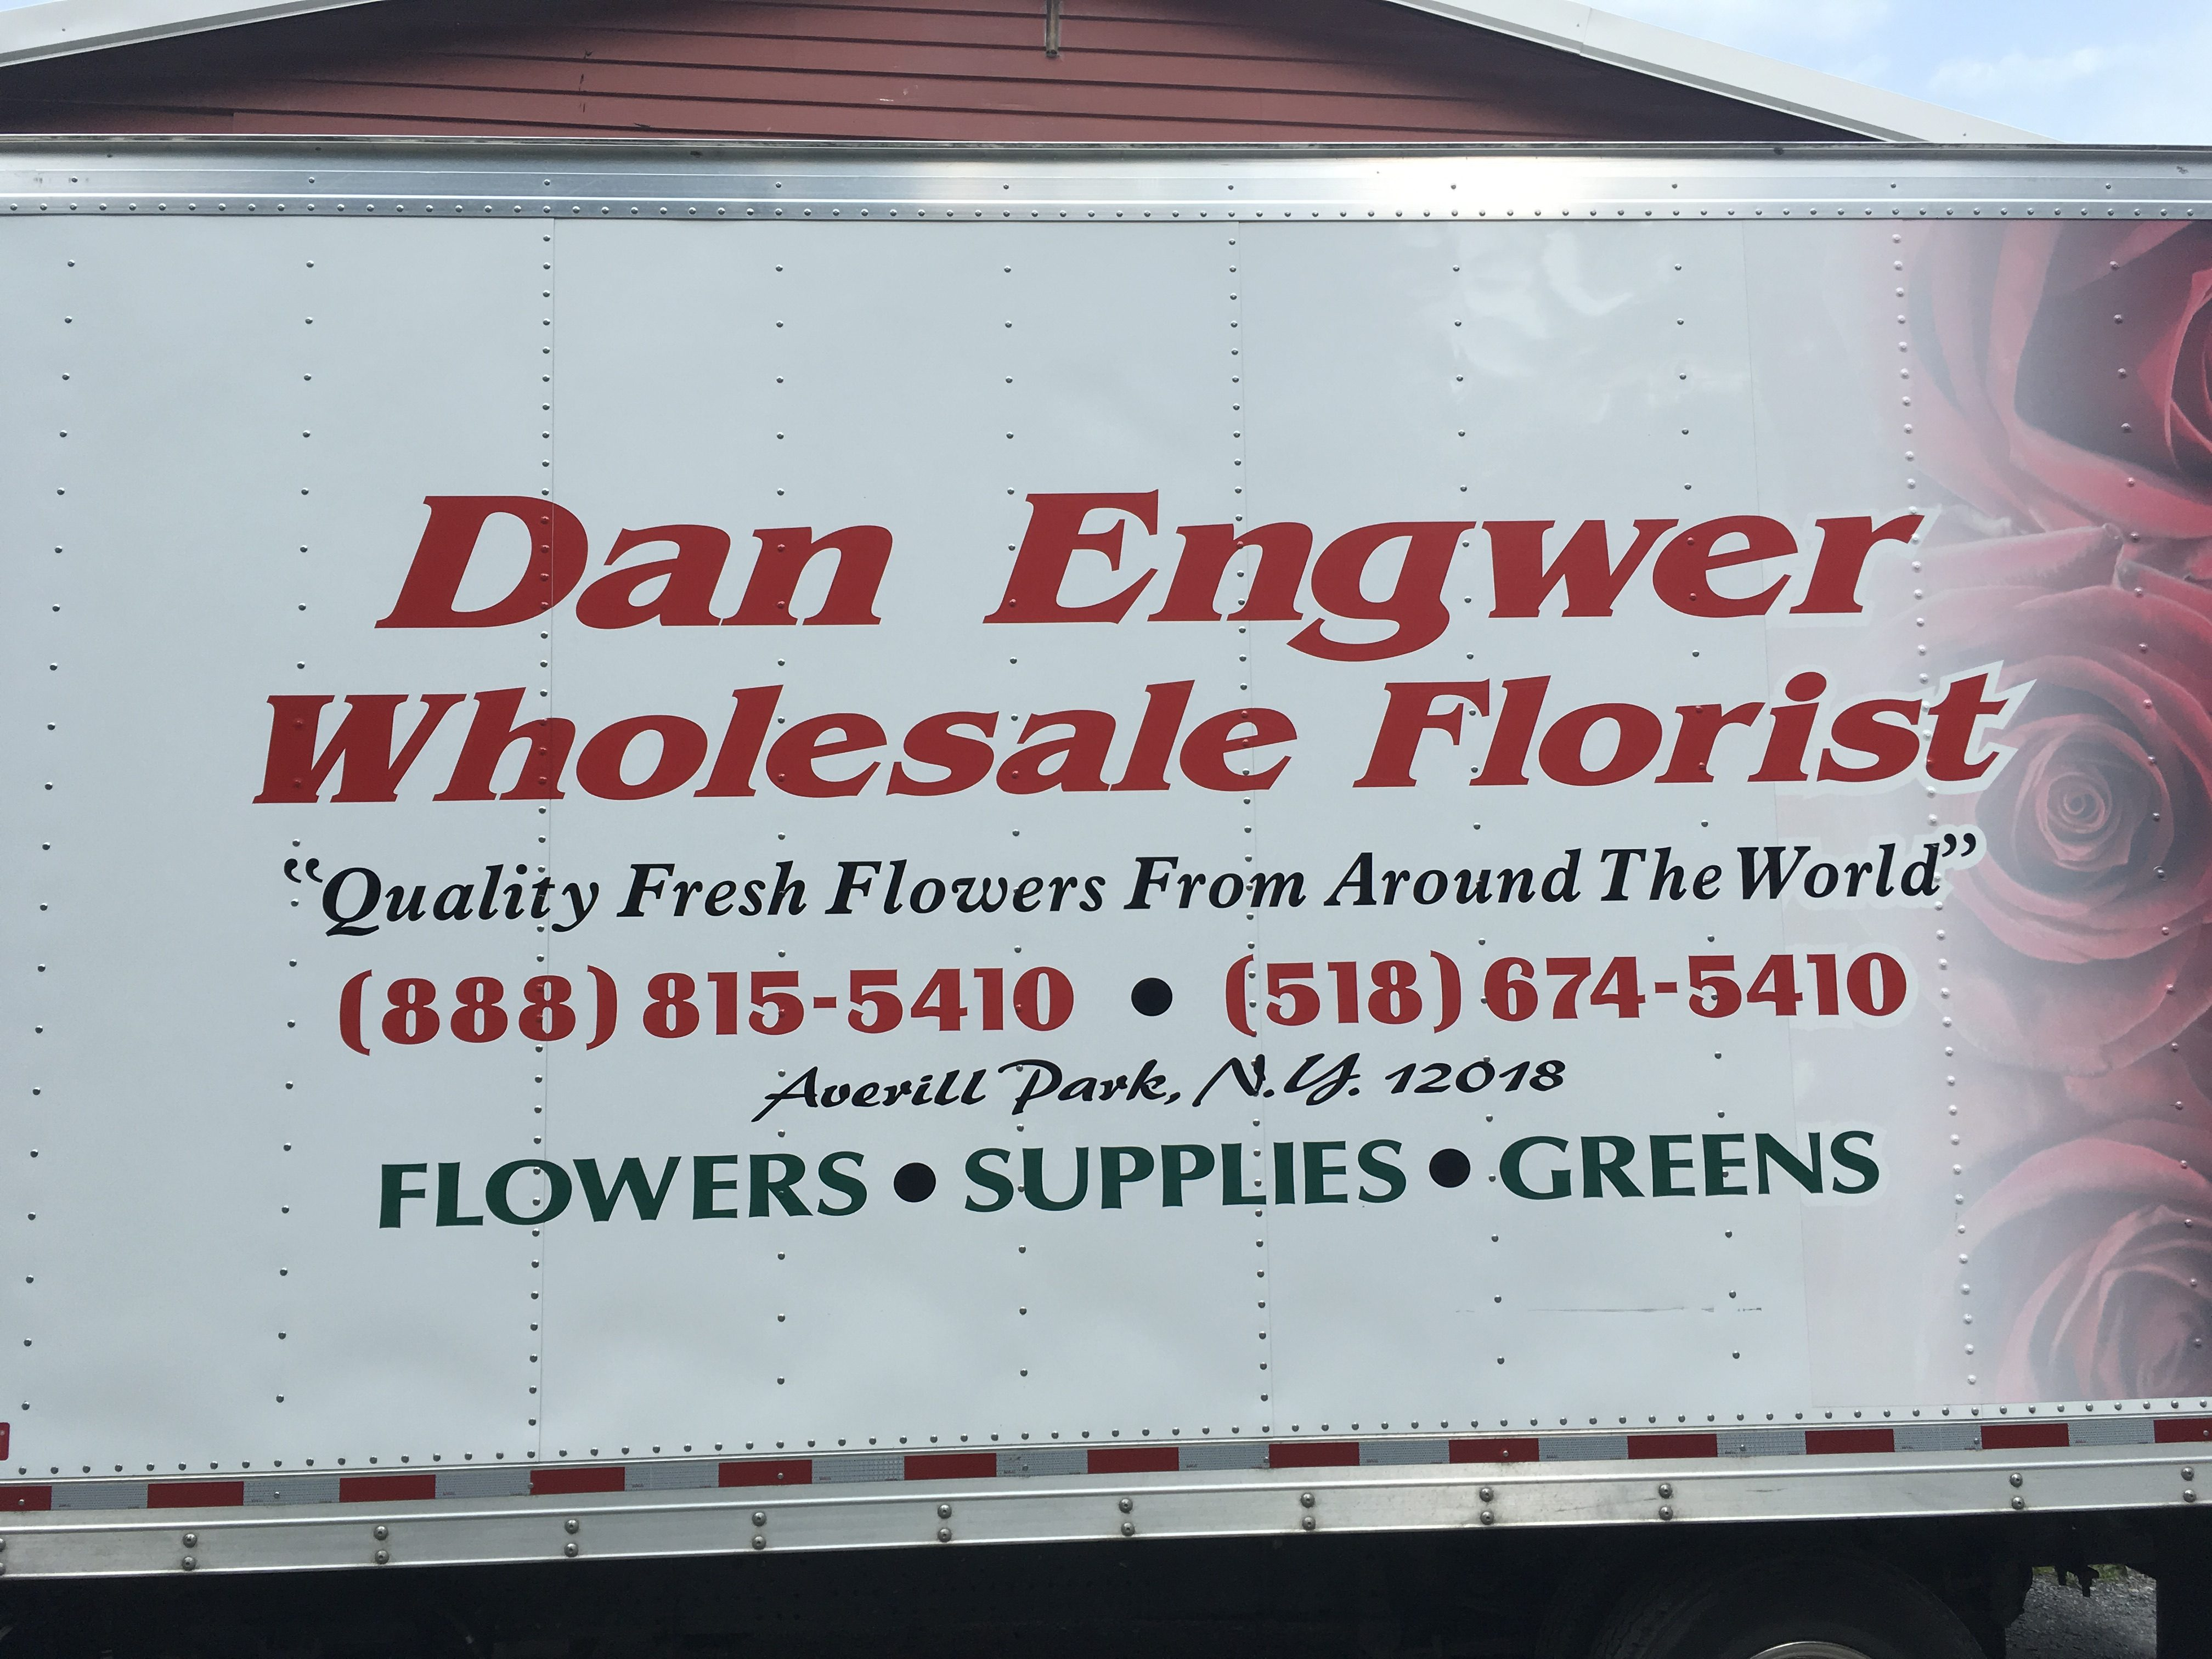 Dan-Engwer-Wholesale-Florist Truck Signage